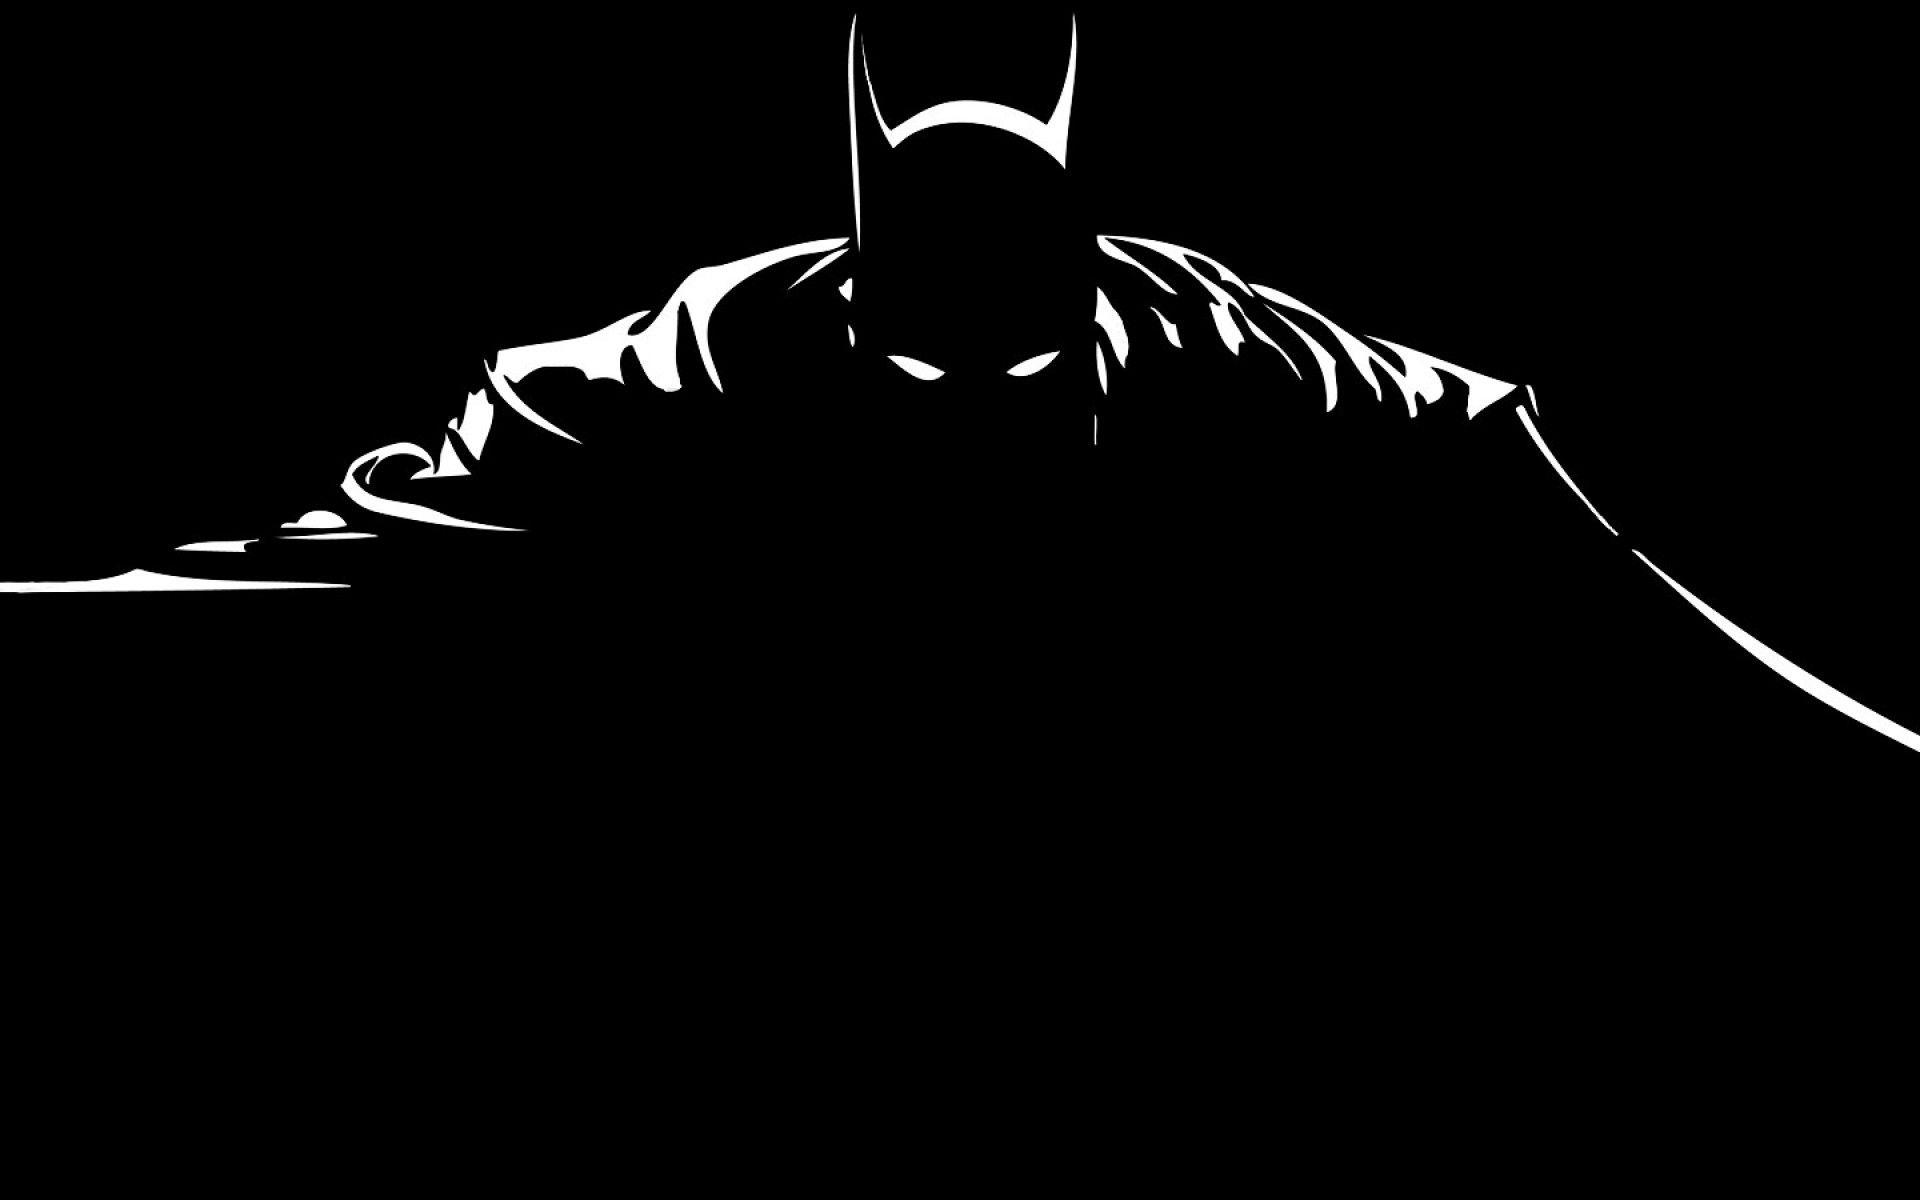 batman backgrounds for computer, 4k mobile wallpaper